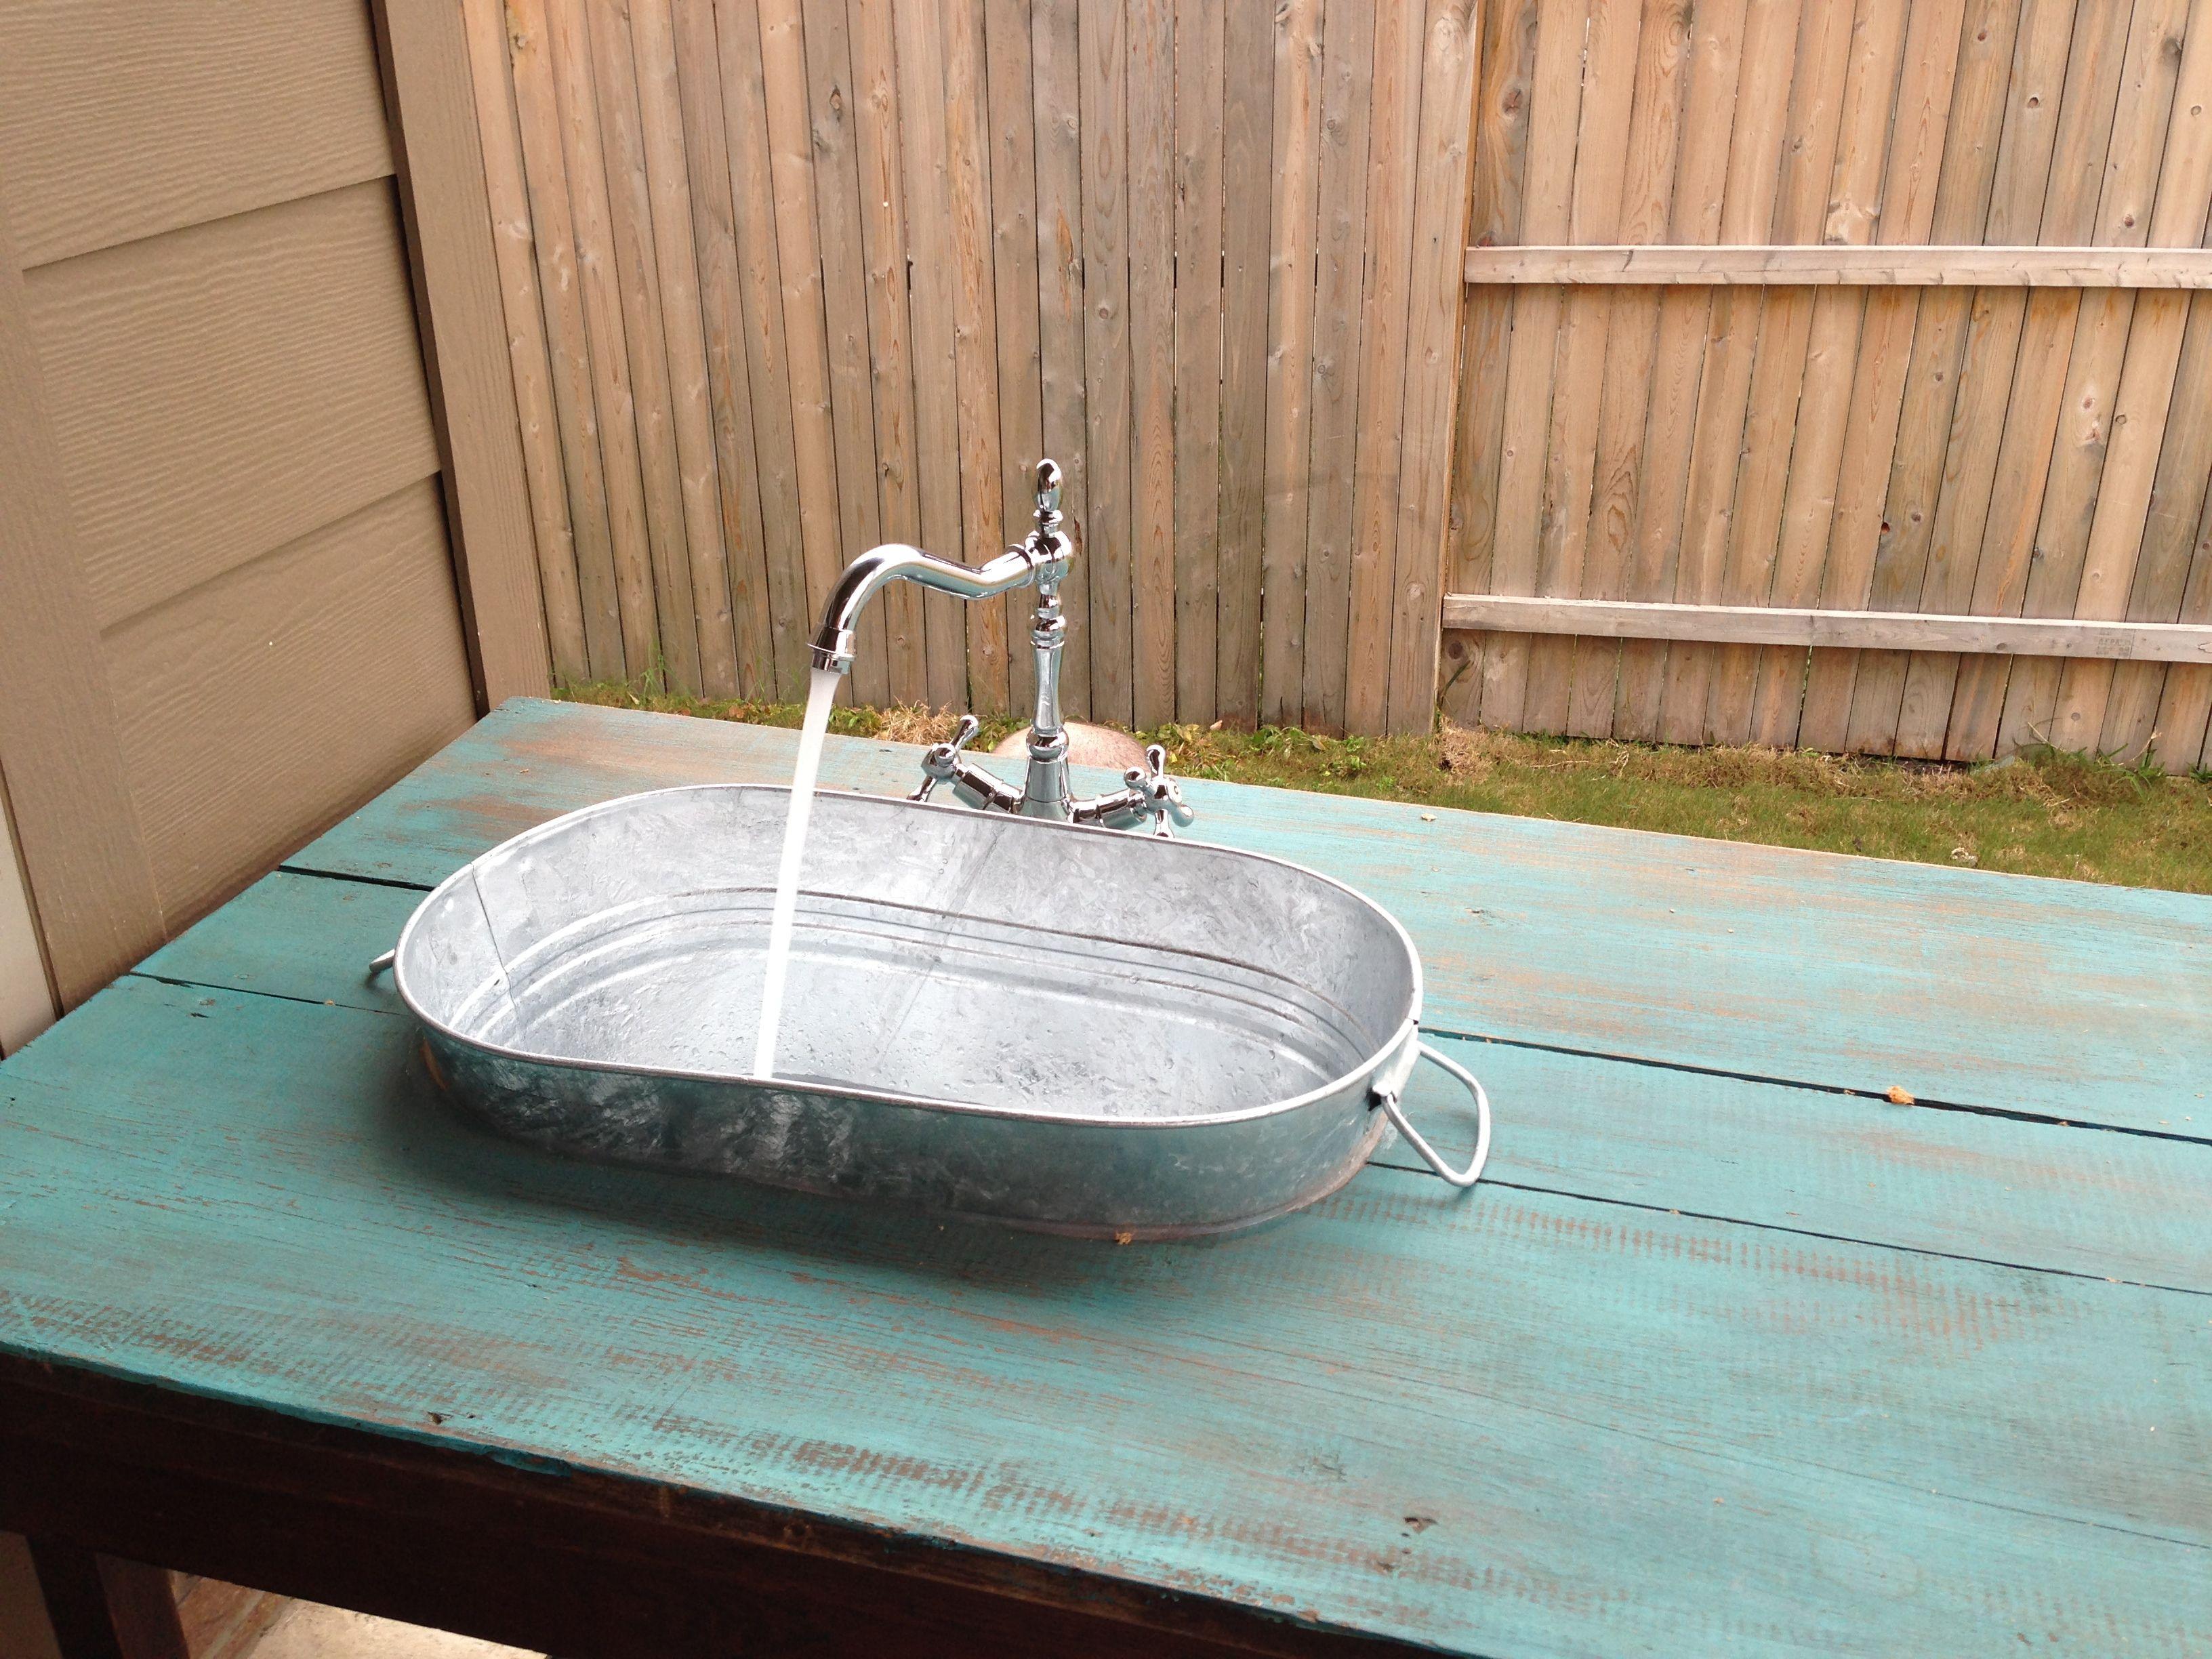 DIY outdoor sink  Craftiness  Pinterest  Outdoor sinks